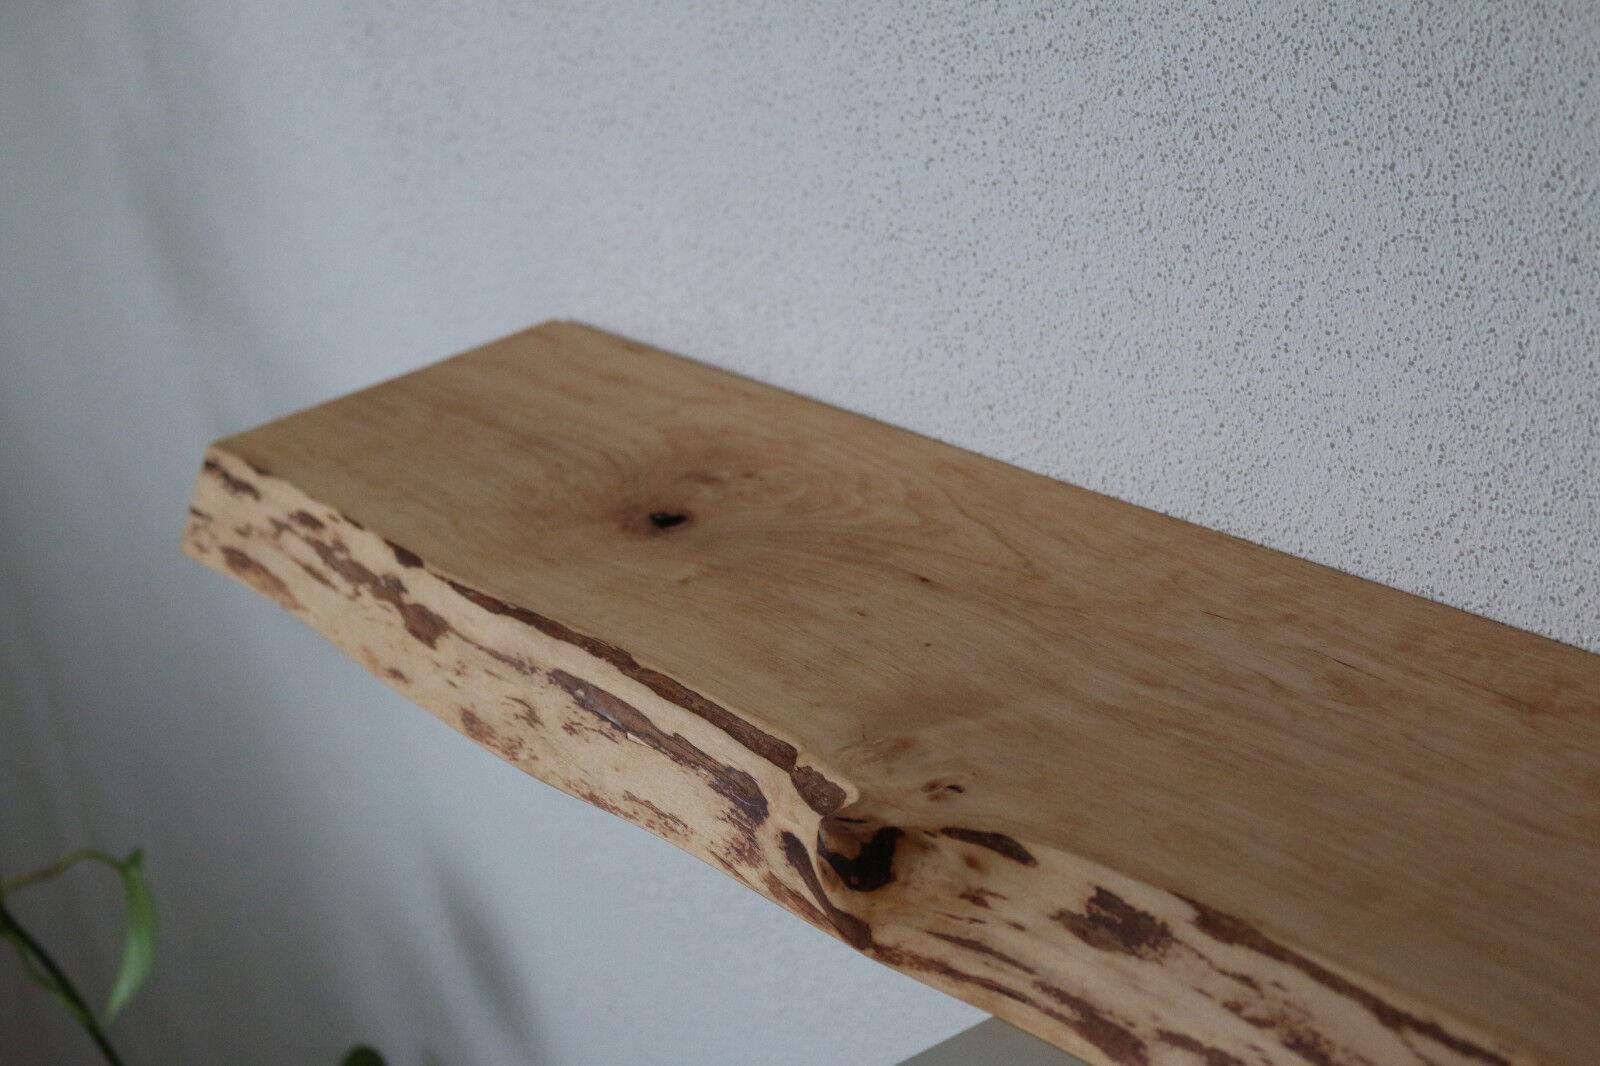 wandboard erle massiv holz board regal steckboard regalbrett baumkante brett neu eur 175 00. Black Bedroom Furniture Sets. Home Design Ideas